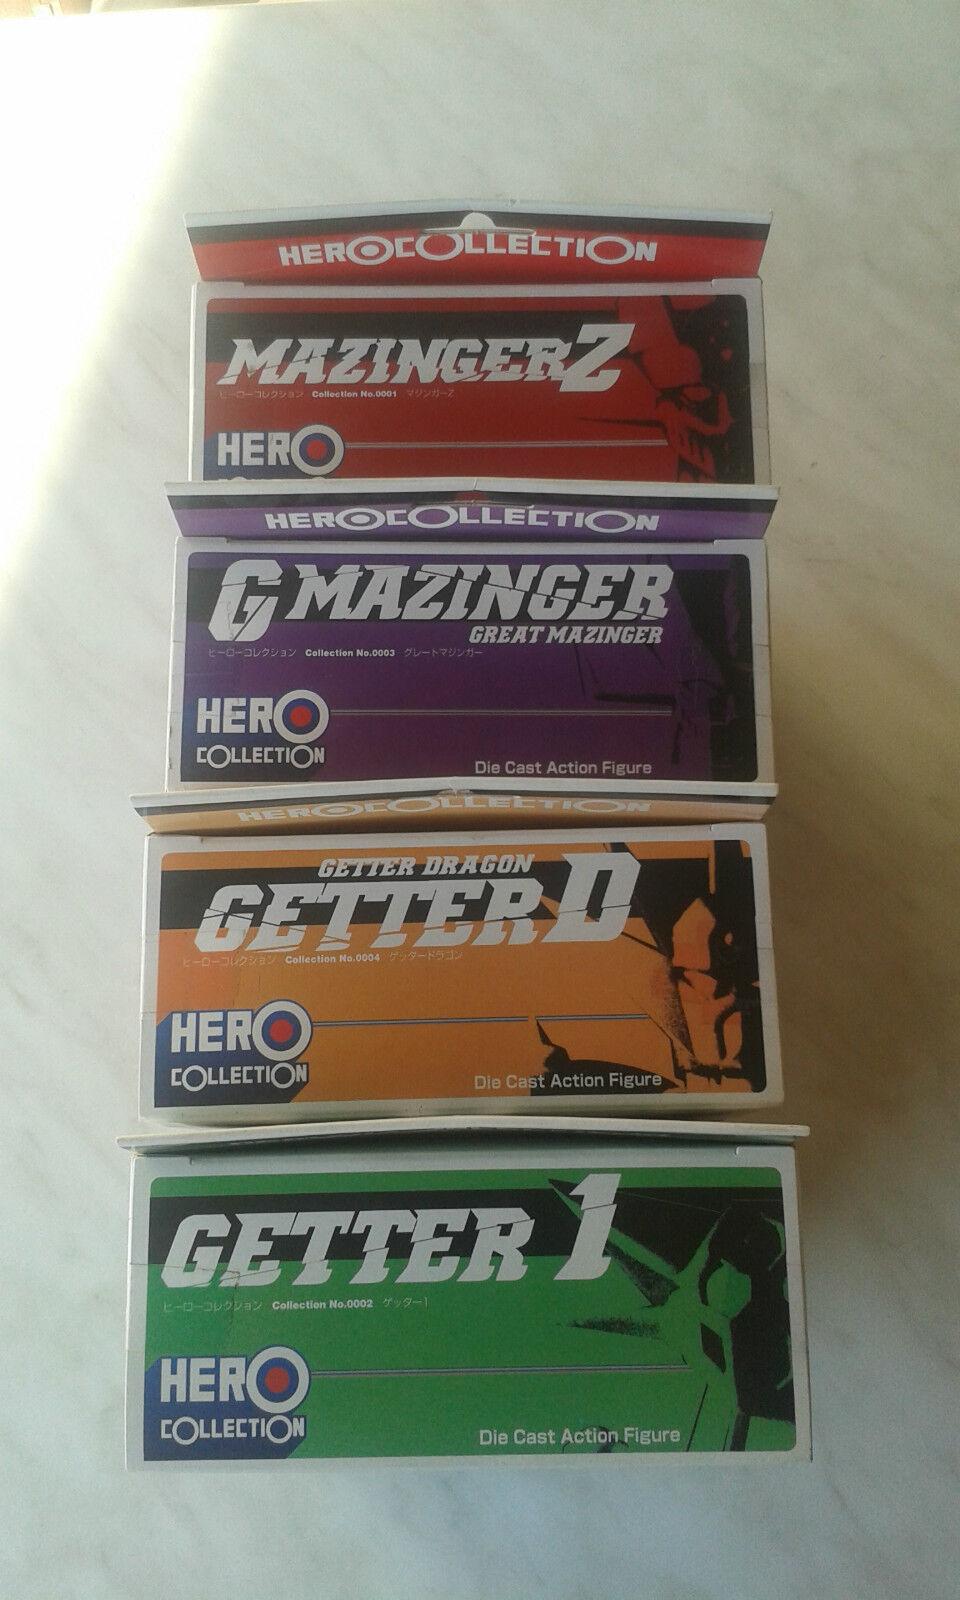 HERO COLLECTION,COMPLETA,MAZINGER,GETTER,DIECAST FIG FIG FIG ROBOT YAMATO,GO NAGAI,NUOVI 88109c